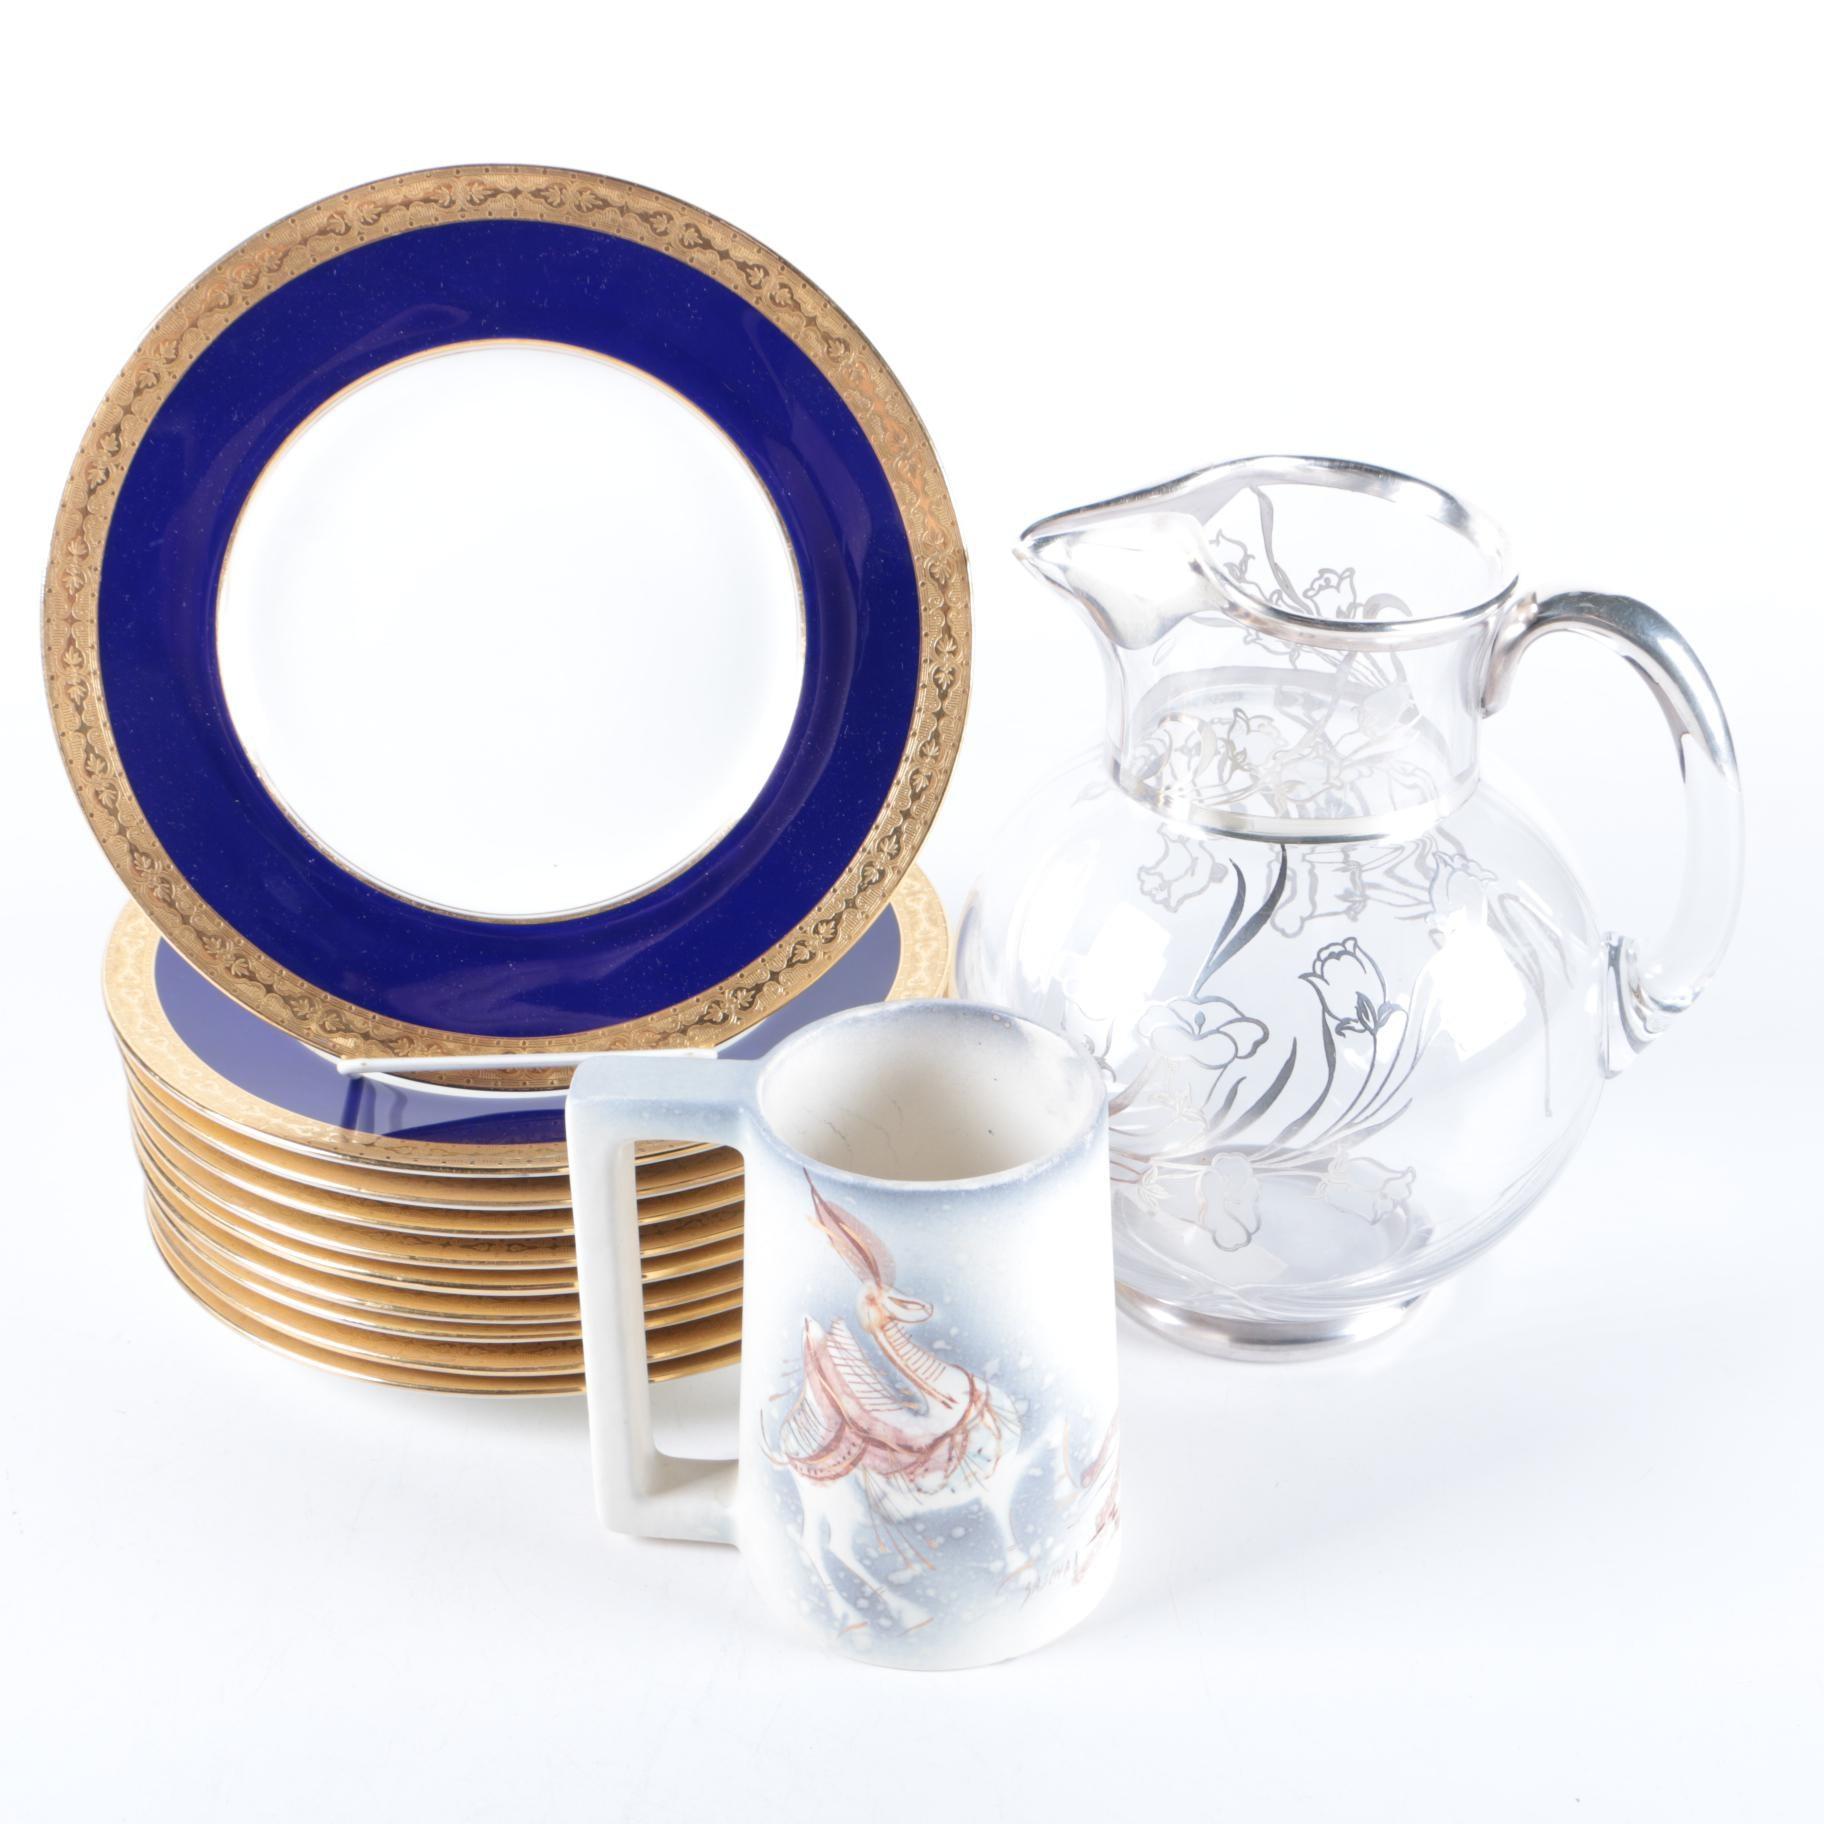 Vintage Tableware Including Minton and Sascha Brastoff